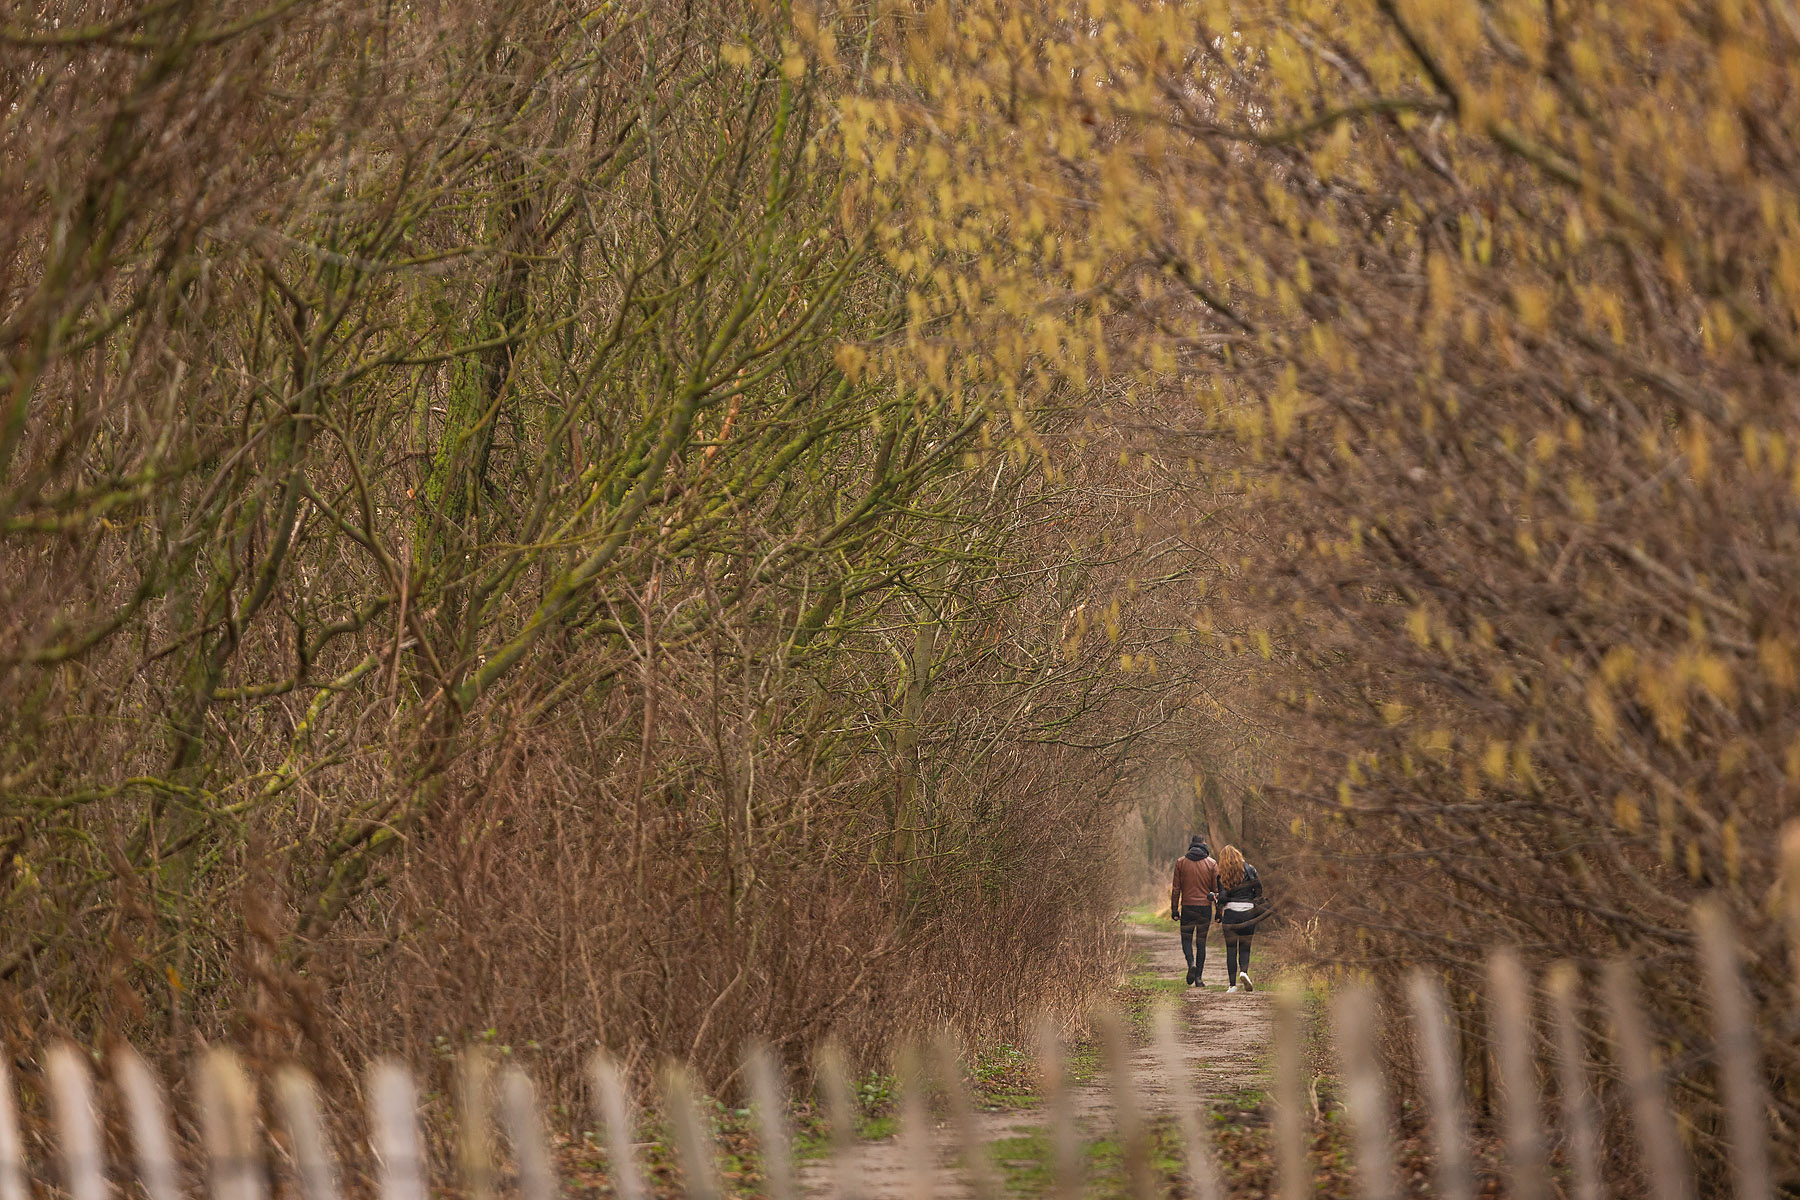 glenn vanderbeke, landschapsfotografie, landschapsfotograaf, foto uitstap, foto dagtrip, fotografische dagtrip, fotografie uitstap, foto-uitstap, west-vlaamse fotografen, west-vlaamse fotograaf, Vlaanderen, wat te doen in Knokke-Heist, wat te doen in Heist, Natuurfotografie in Heist, landschapsfotografie in Heist, landschapsfotografie in Knokke-Heist, De Sashul, groene gordel van Knokke-Heist, De groene gordel van Heist-West, landschapsfotografie Zeebrugge